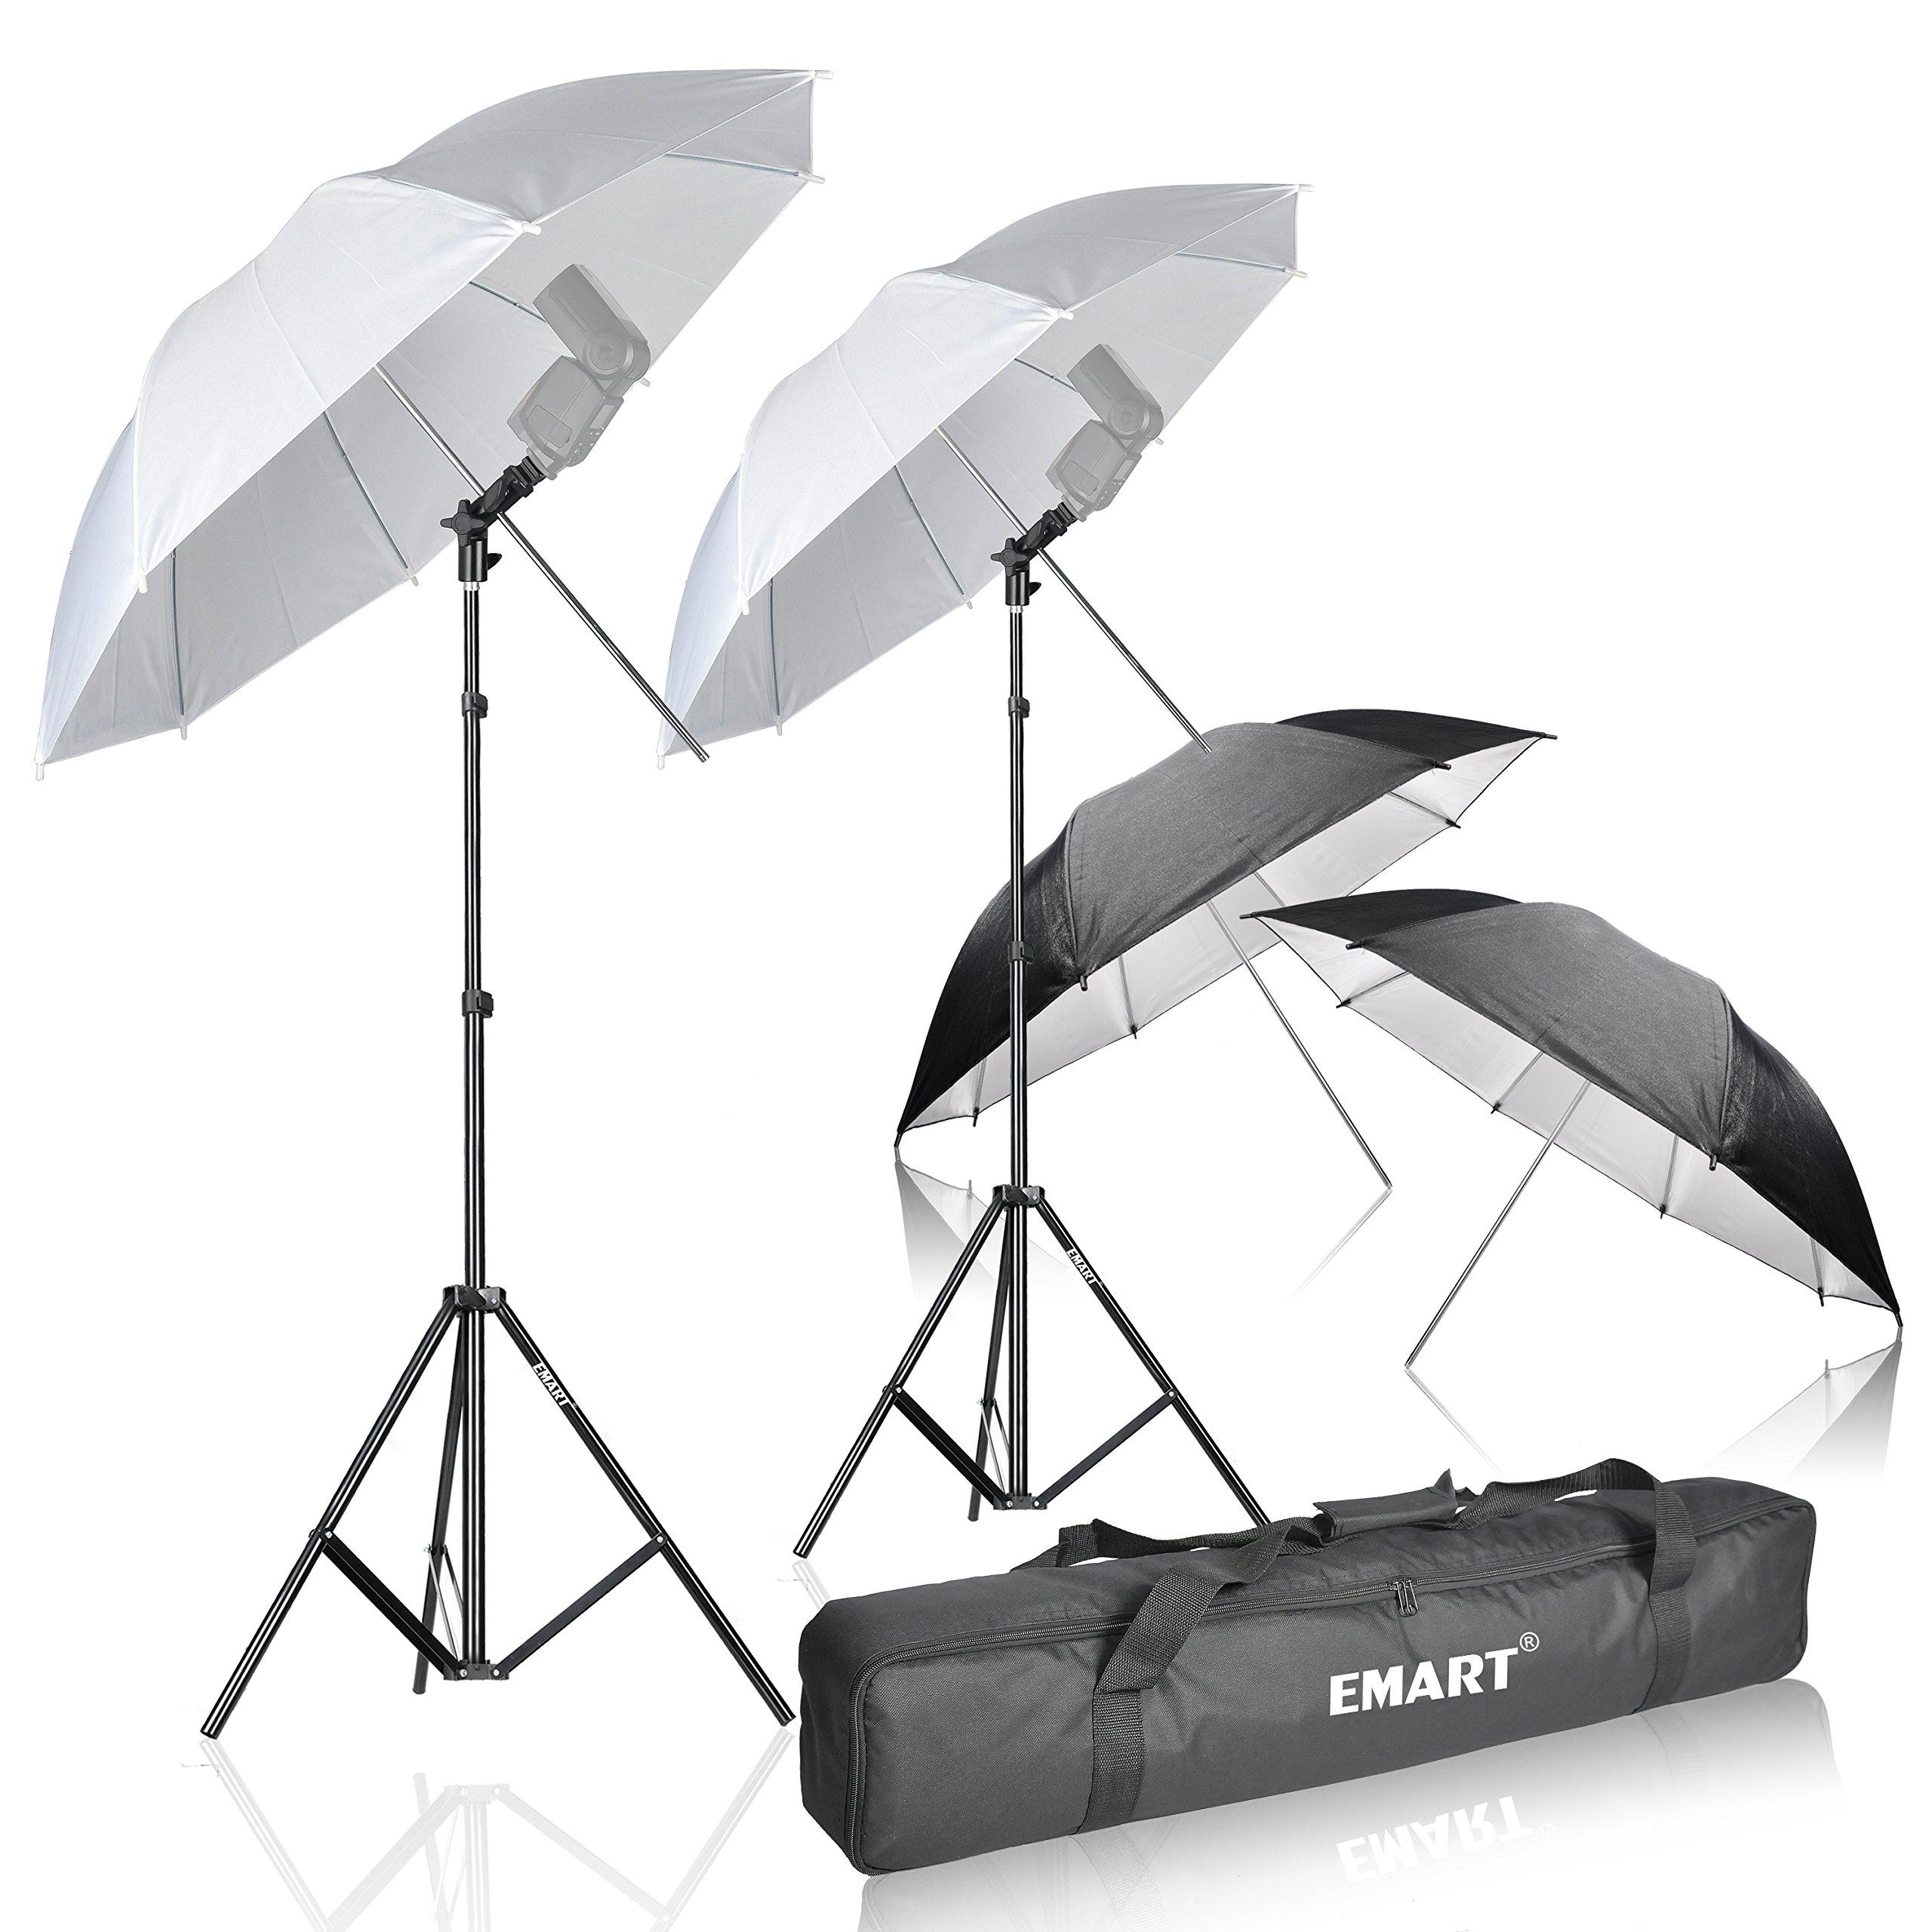 Emart Photo Studio Double Off Camera Speedlight Flash Umbrella Kit, Shoemount E-Type Brackets for Photography by EMART